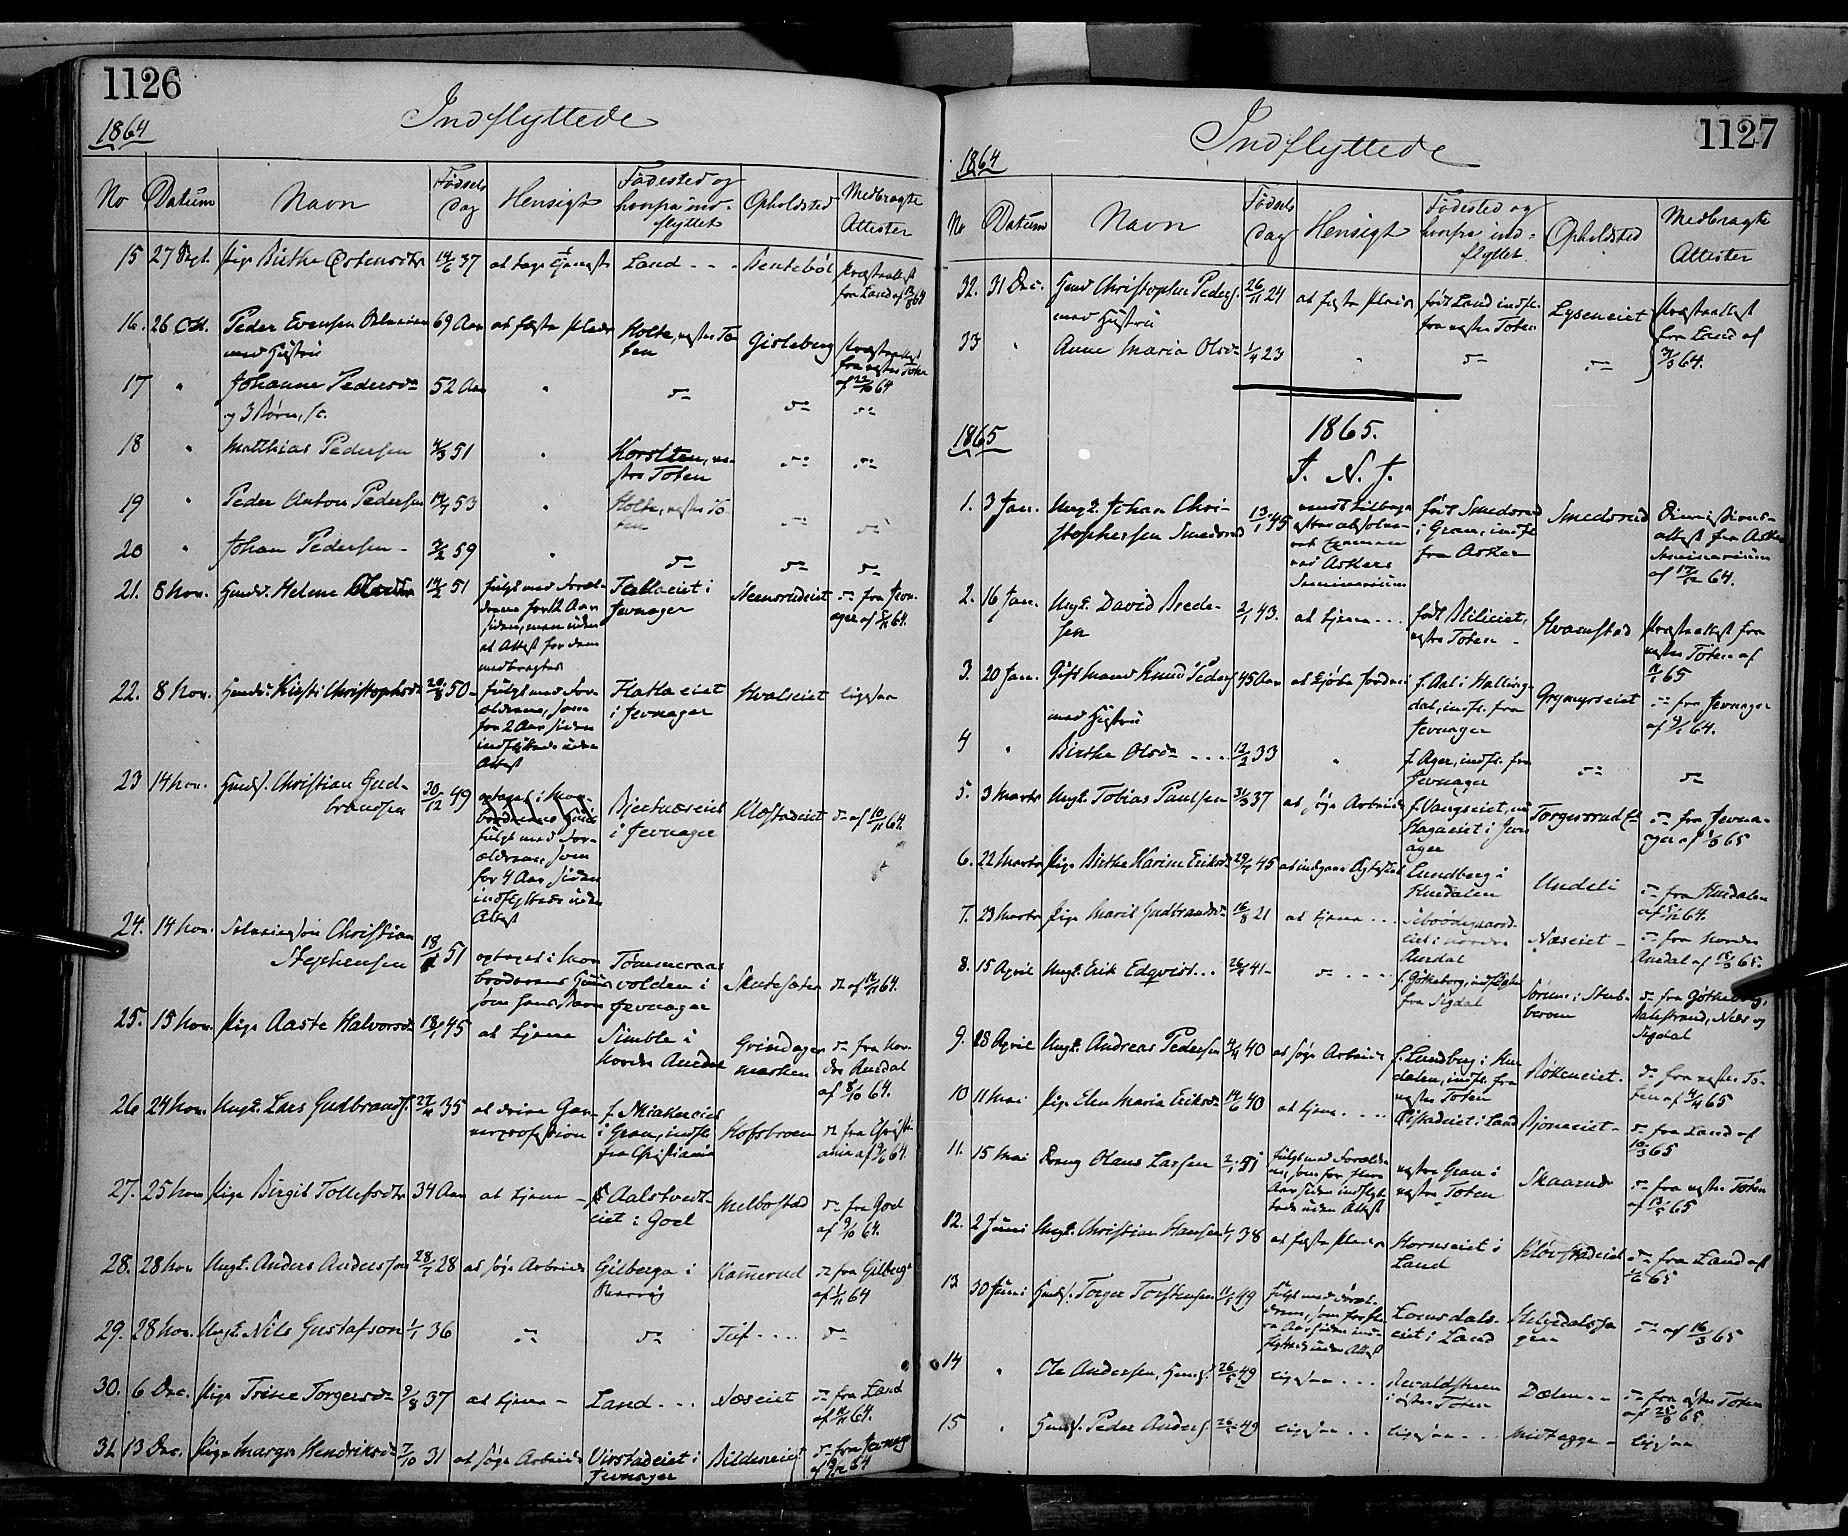 SAH, Gran prestekontor, Ministerialbok nr. 12, 1856-1874, s. 1126-1127